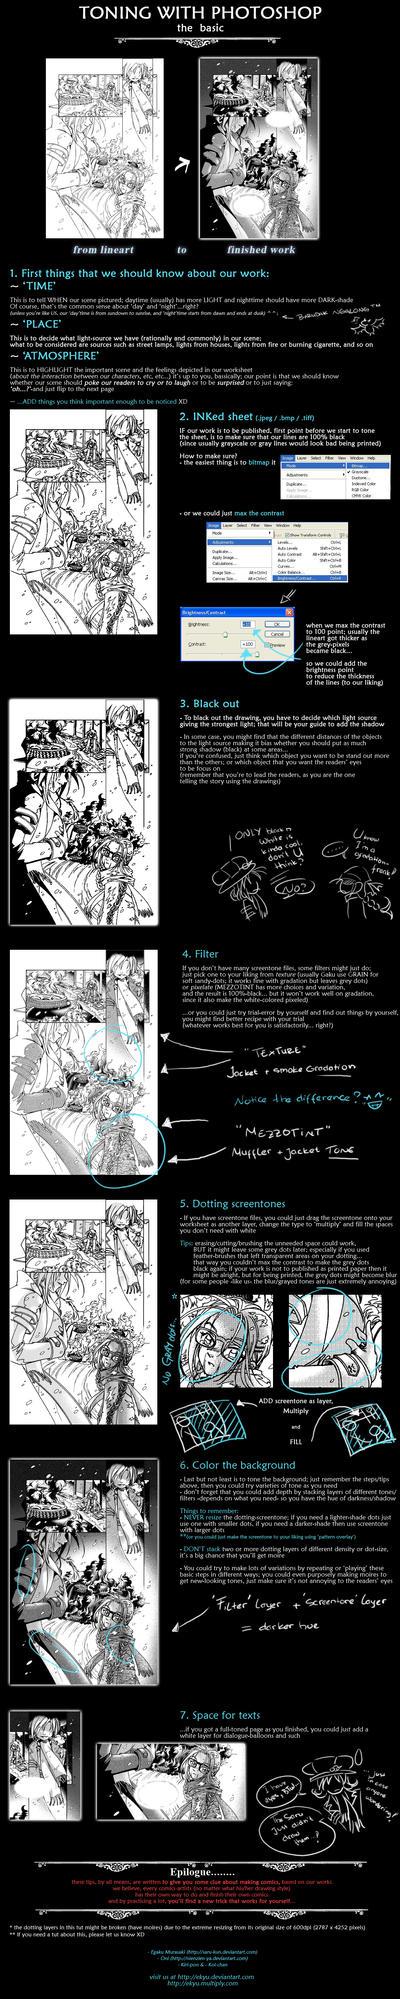 Comics: Toning with Photoshop by ekyu